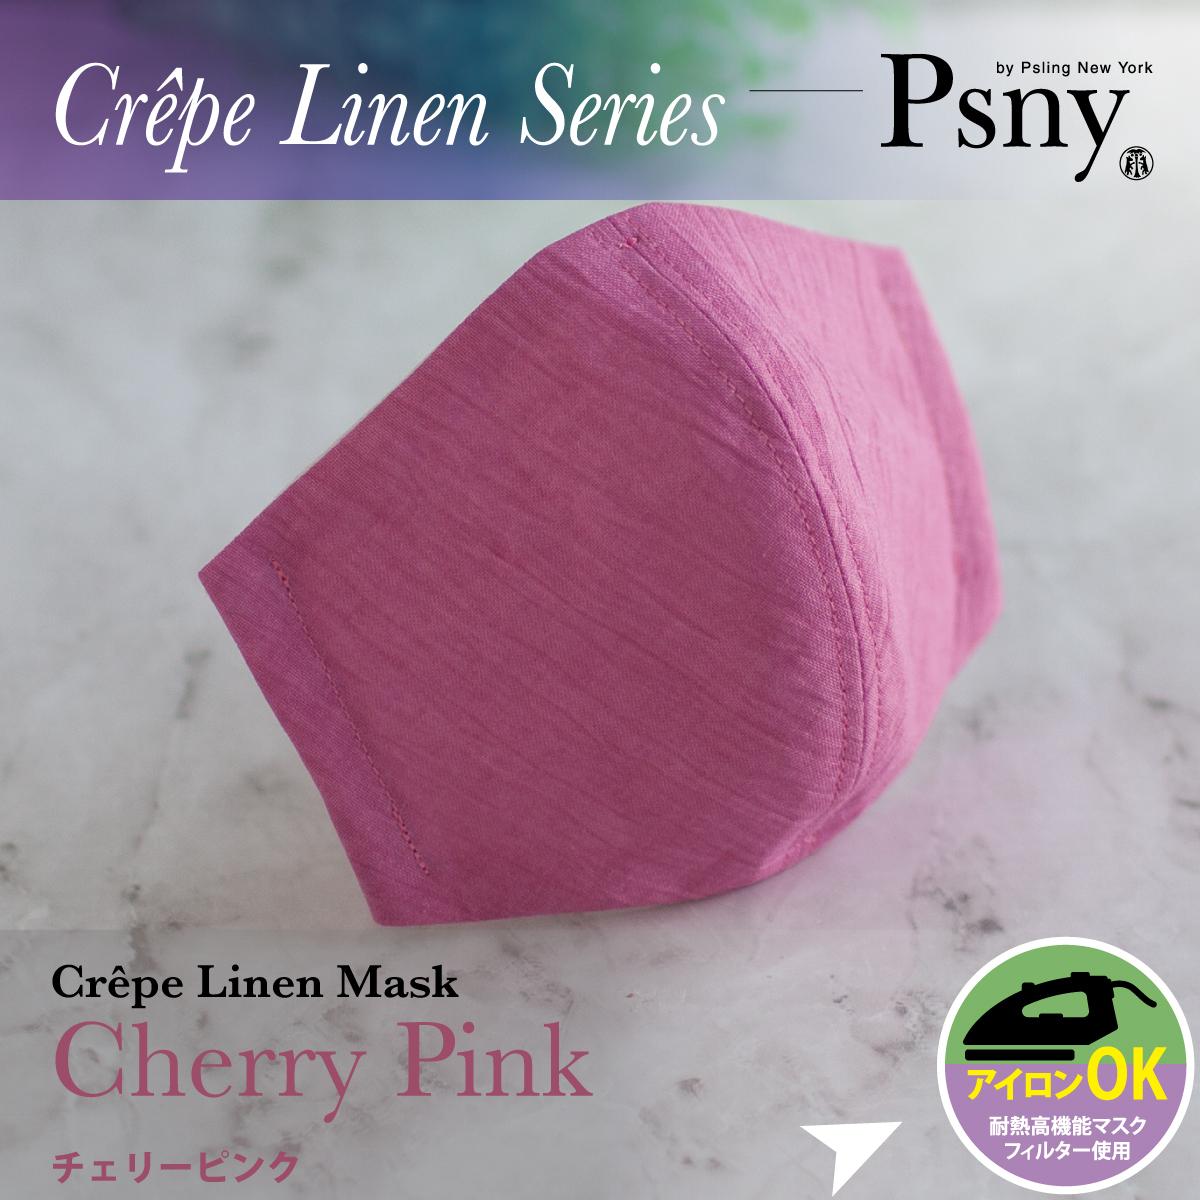 PSNY クレープ リネン・チェリーピンク 花粉 黄砂 洗える不織布フィルター入り 立体 大人用 マスク 送料無料 P09